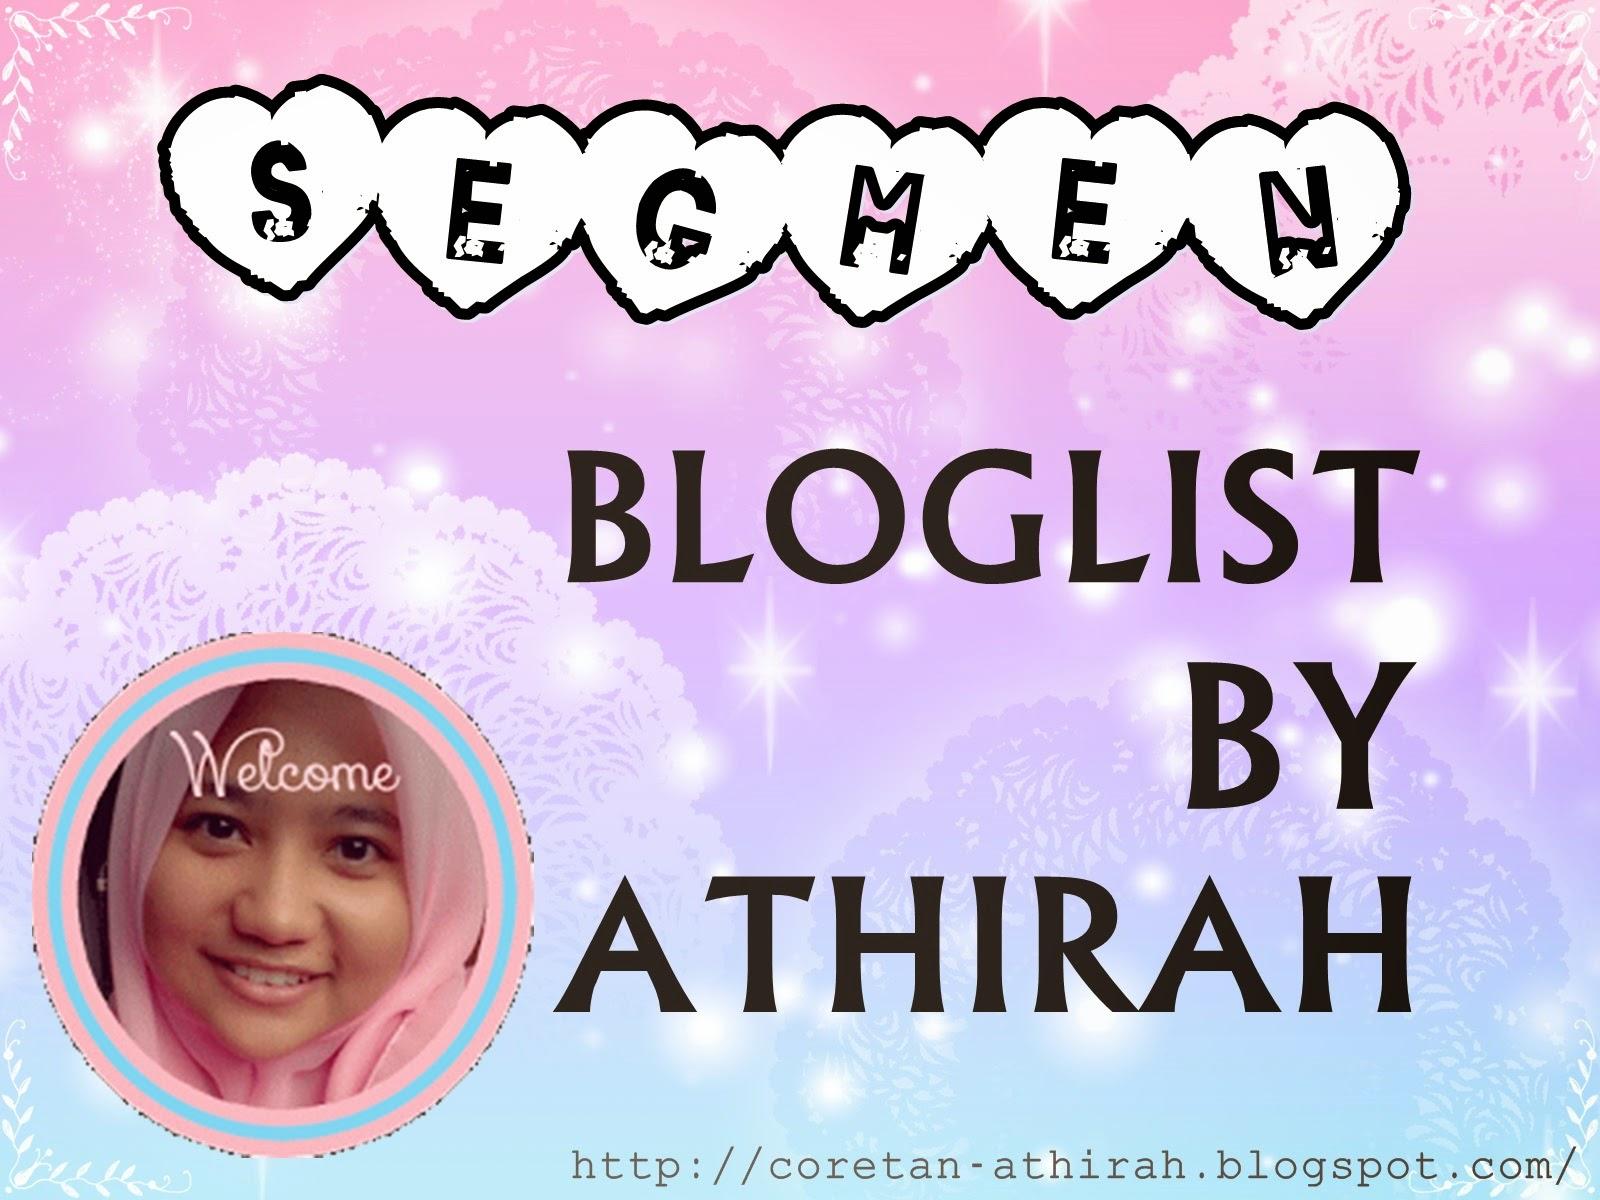 http://coretan-athirah.blogspot.com/2014/05/segmen-pencarian-bloglist-mei-jun-14.html